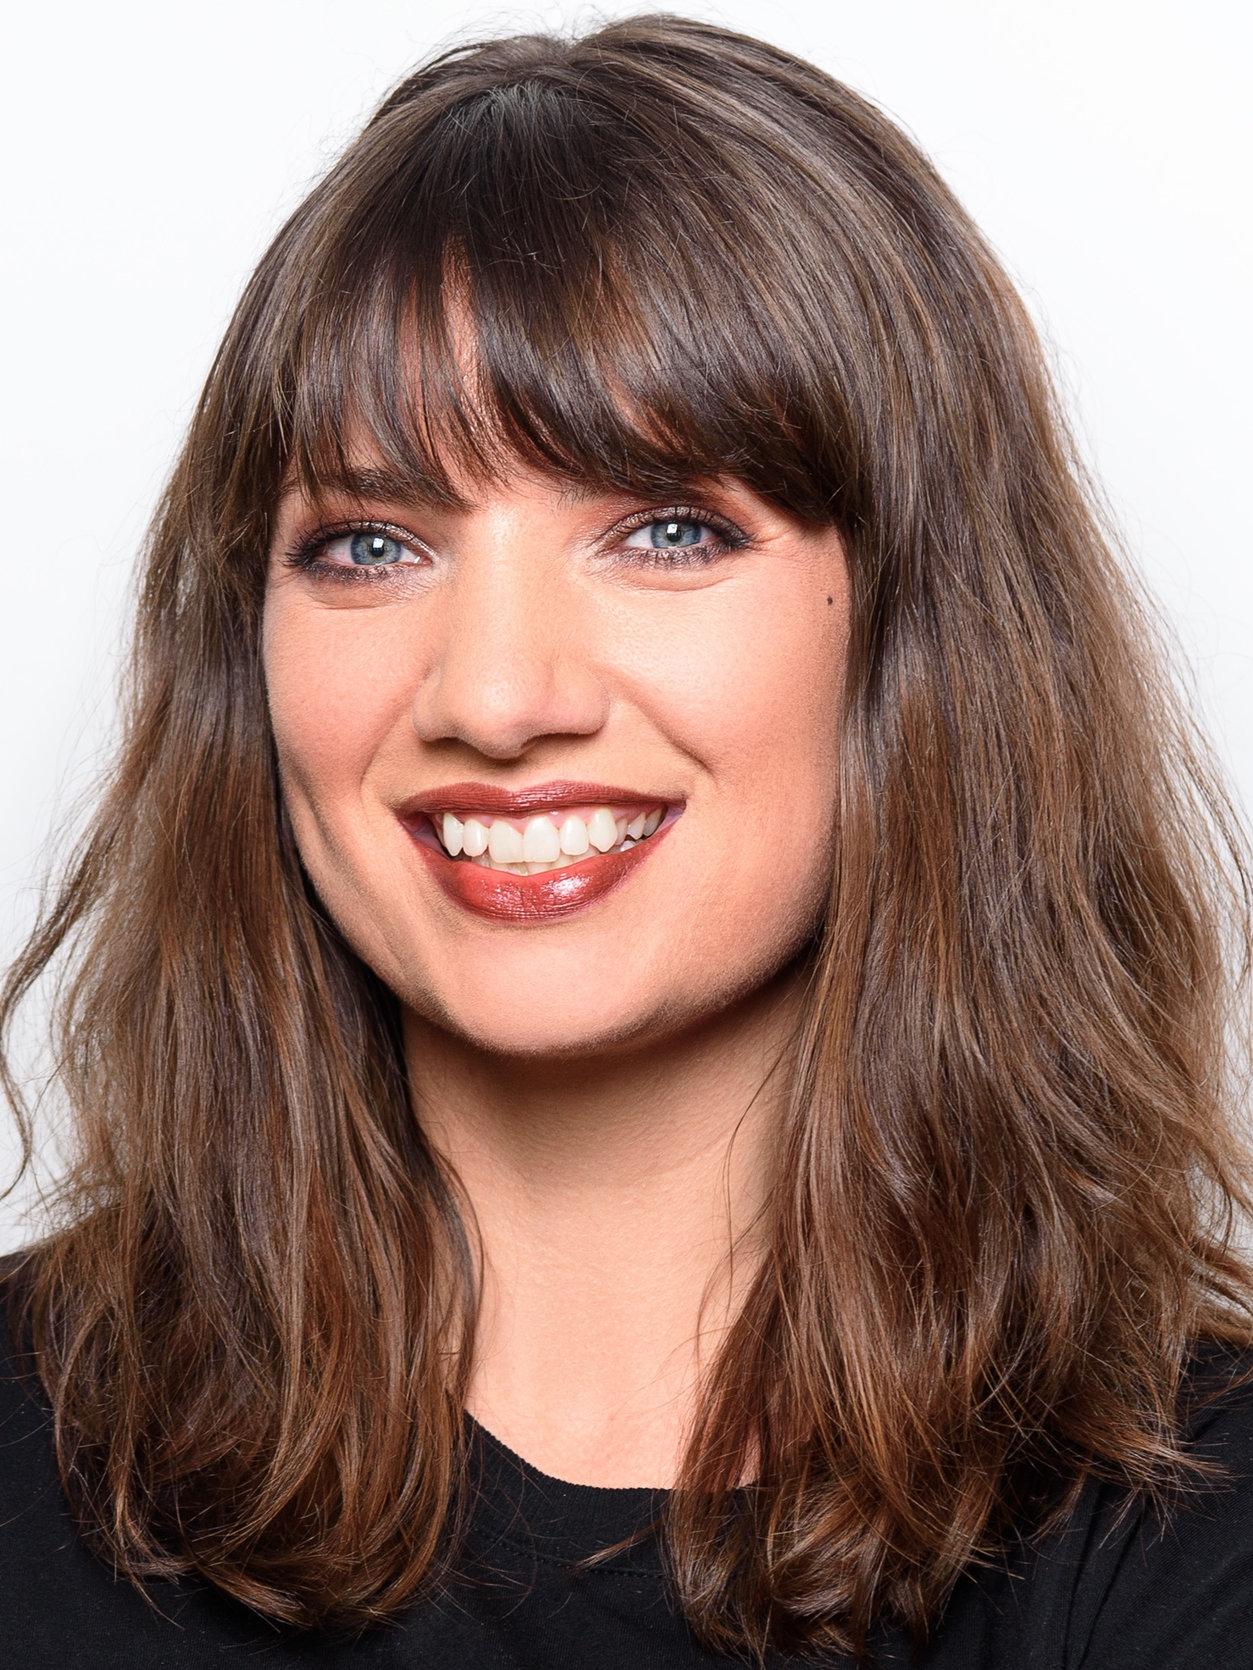 ames-amore-ray-makeup-artist-educator.jpg